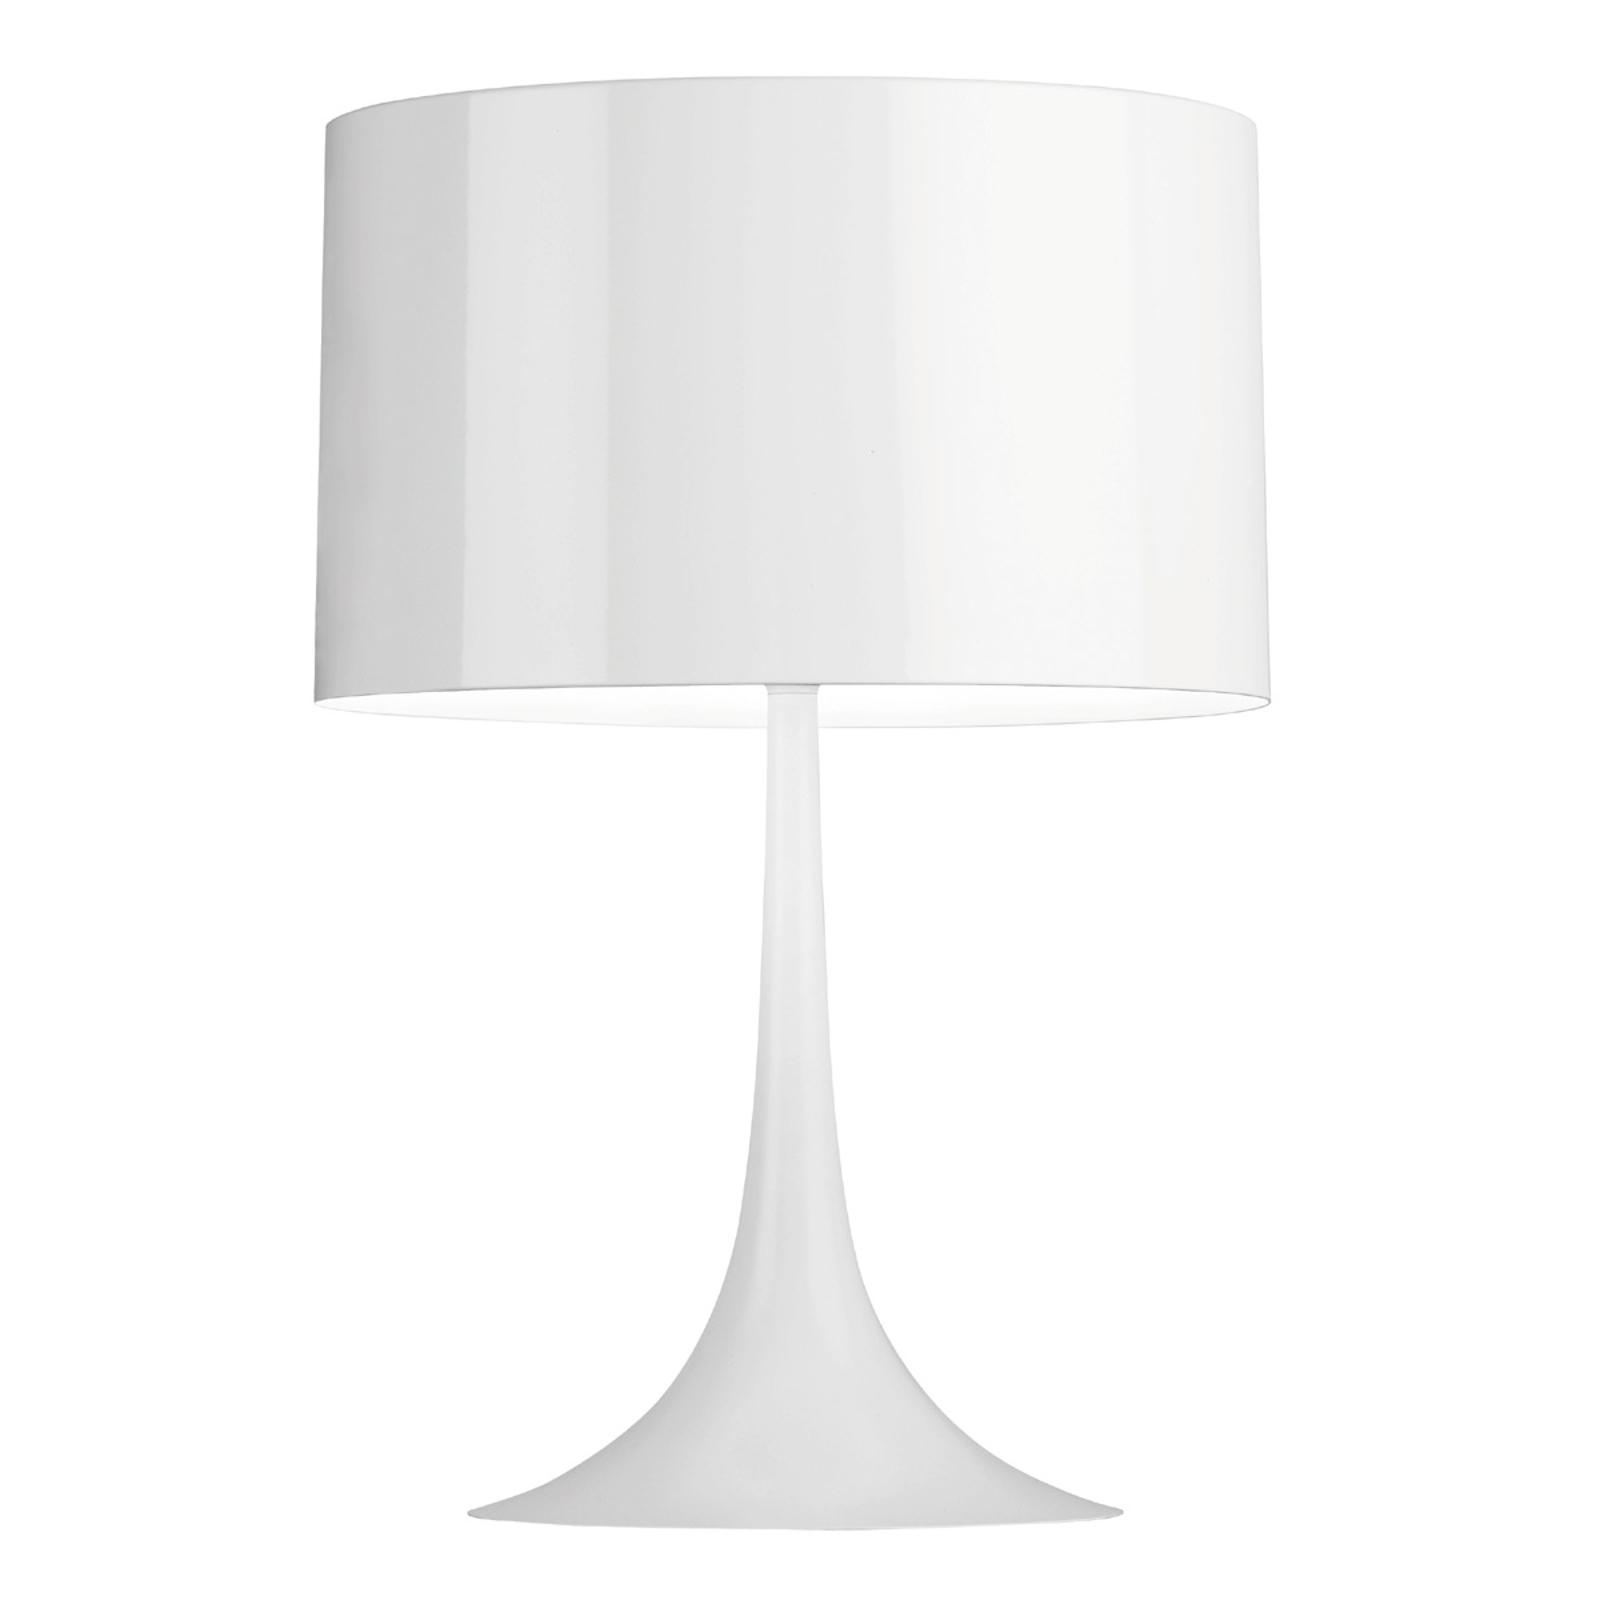 Lampe à poser harmonieuse SPUN LIGHT blanche